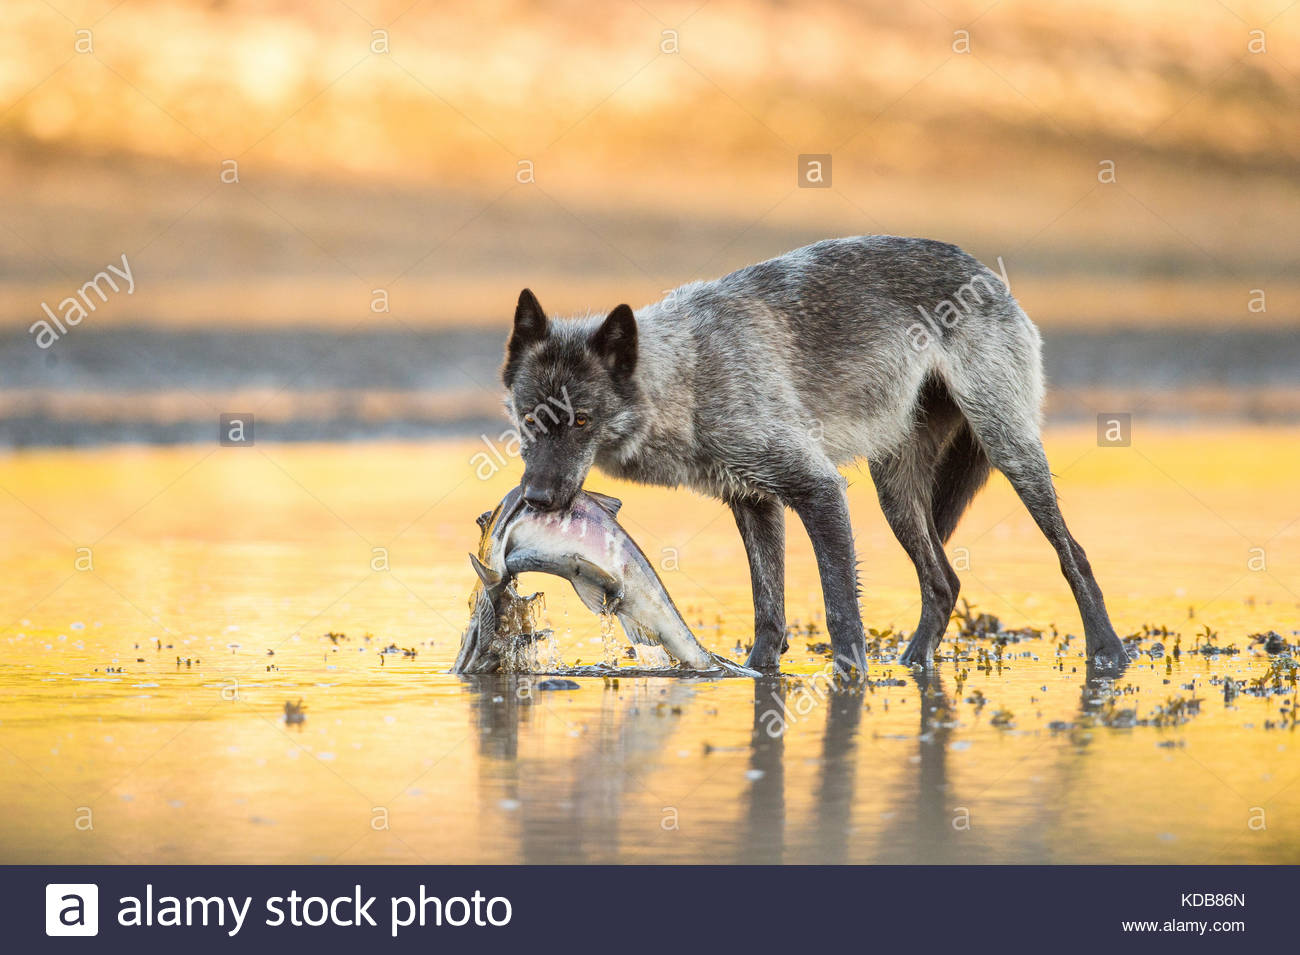 A dark coastal wolf, Canis lupus, feeds on a chum salmon, Oncorhynchus keta. - Stock Image